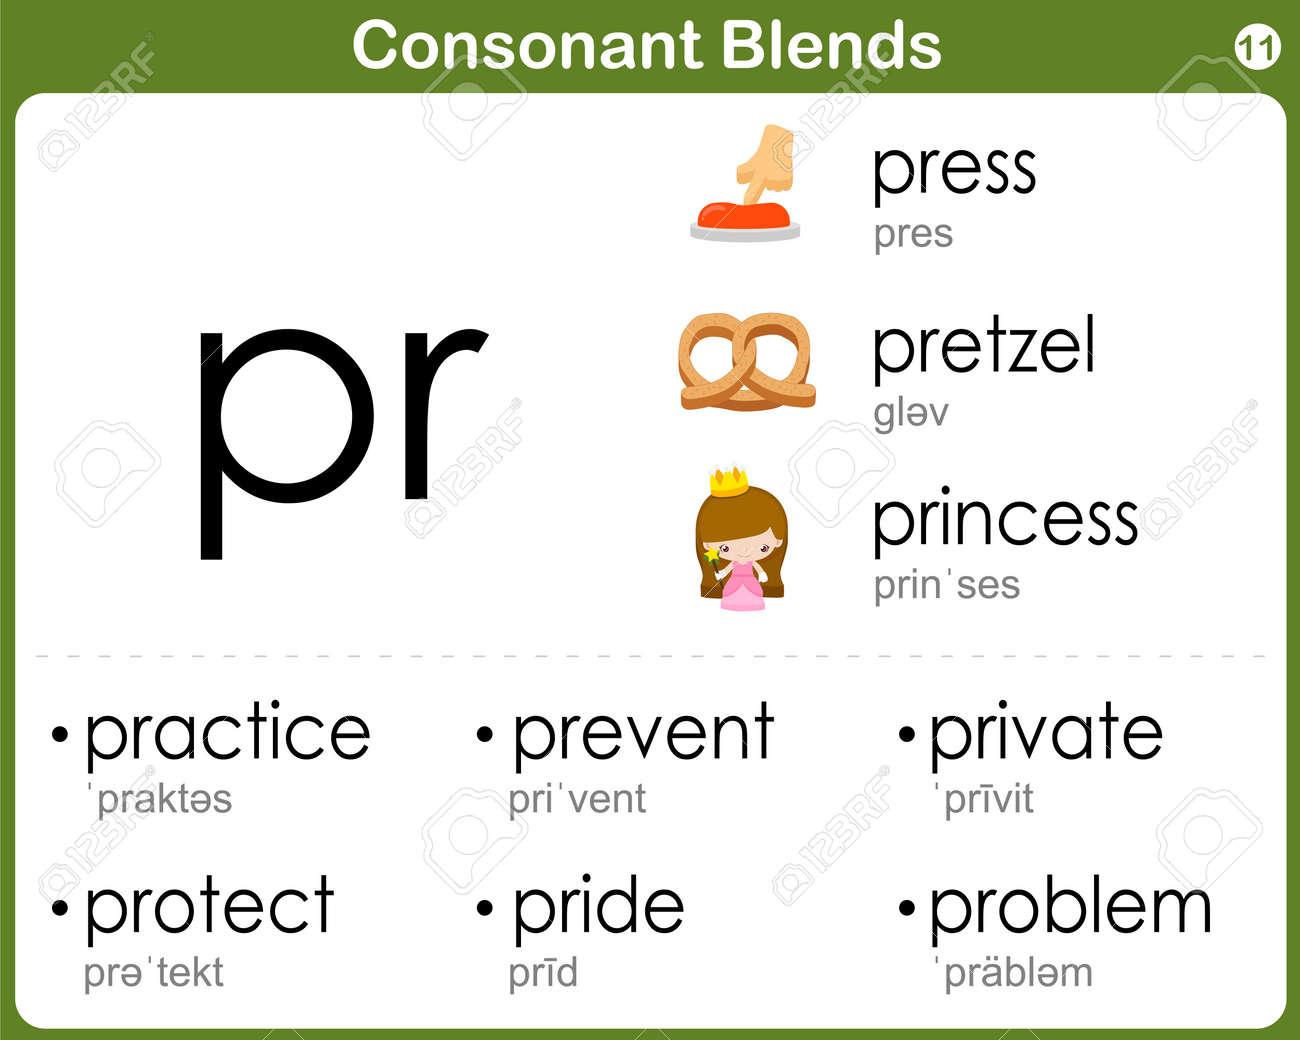 worksheet Consonant Blend Worksheets worksheets consonant blend biggone blends worksheet for kids royalty free cliparts vectors stock vector 36645925